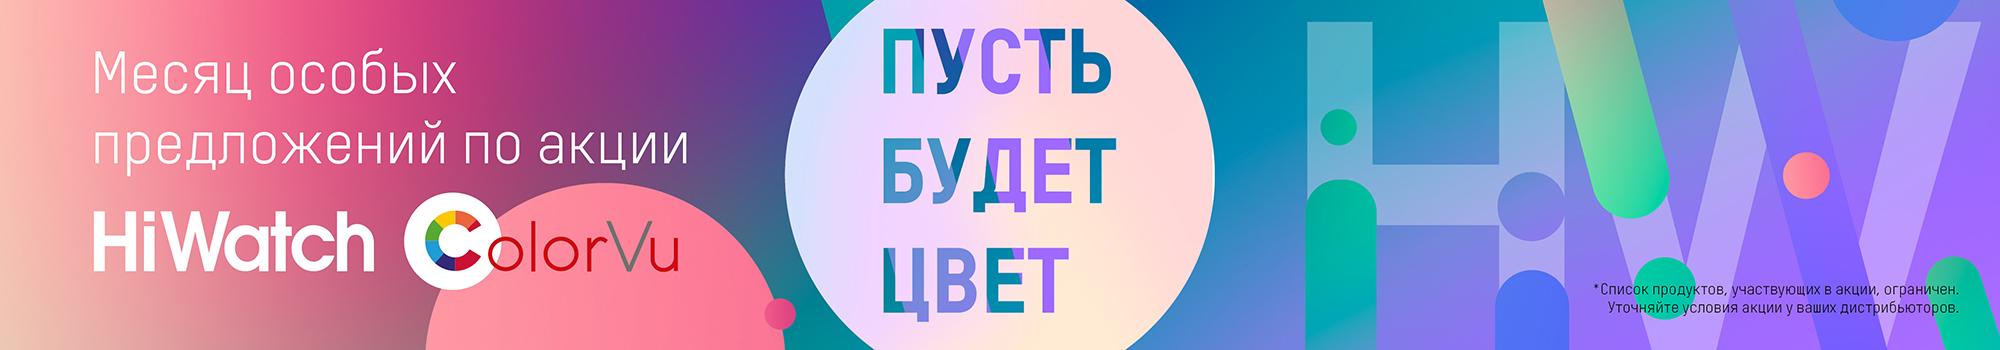 2_promo_colorvu_hw3